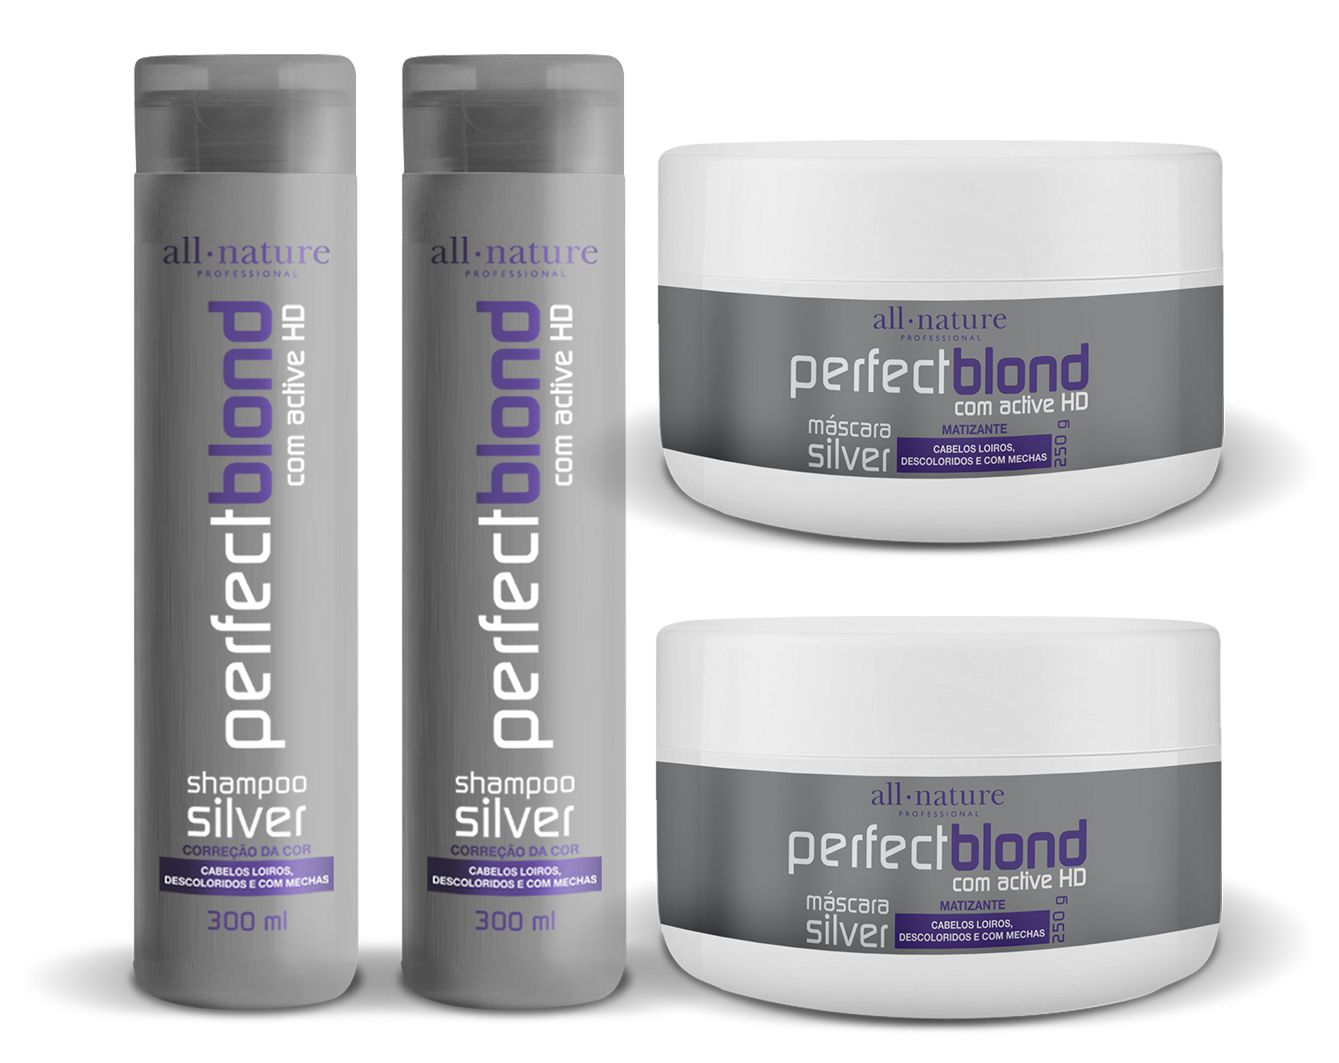 Shampoo Silver Matizante Nature Color 300ml 2 + 2 Máscaras Perfect Blond Correção de Cor Para Loiros, Descoloridoa, Brancos 250g - All Nature